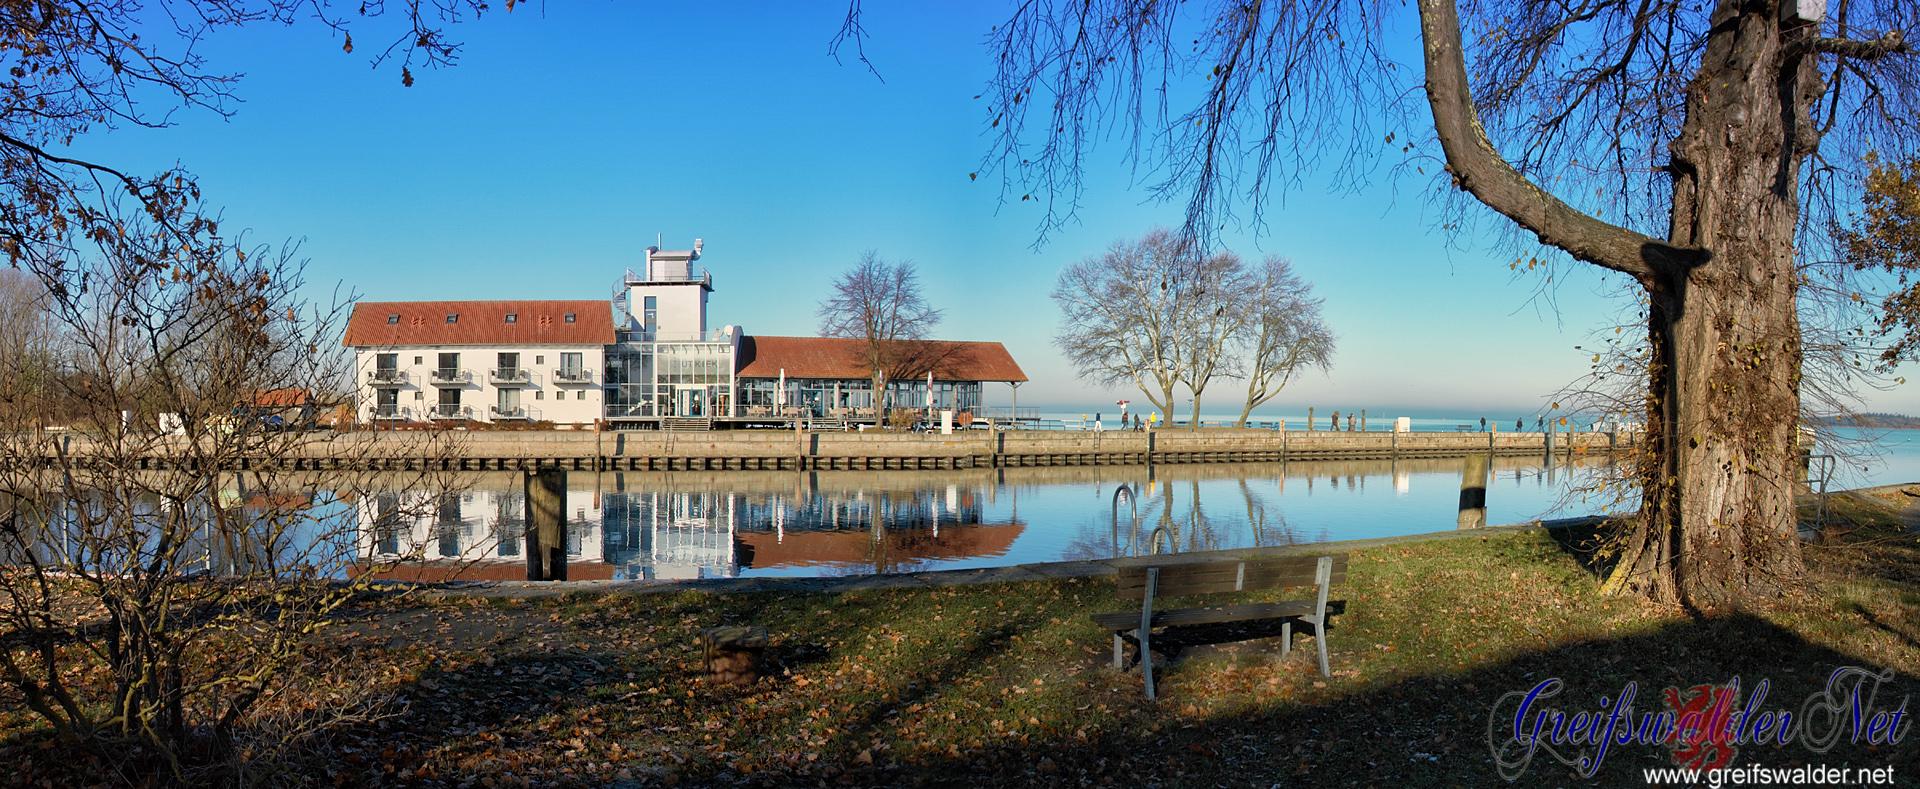 sonniger Nachmittag am Utkiek in Greifswald-Wieck